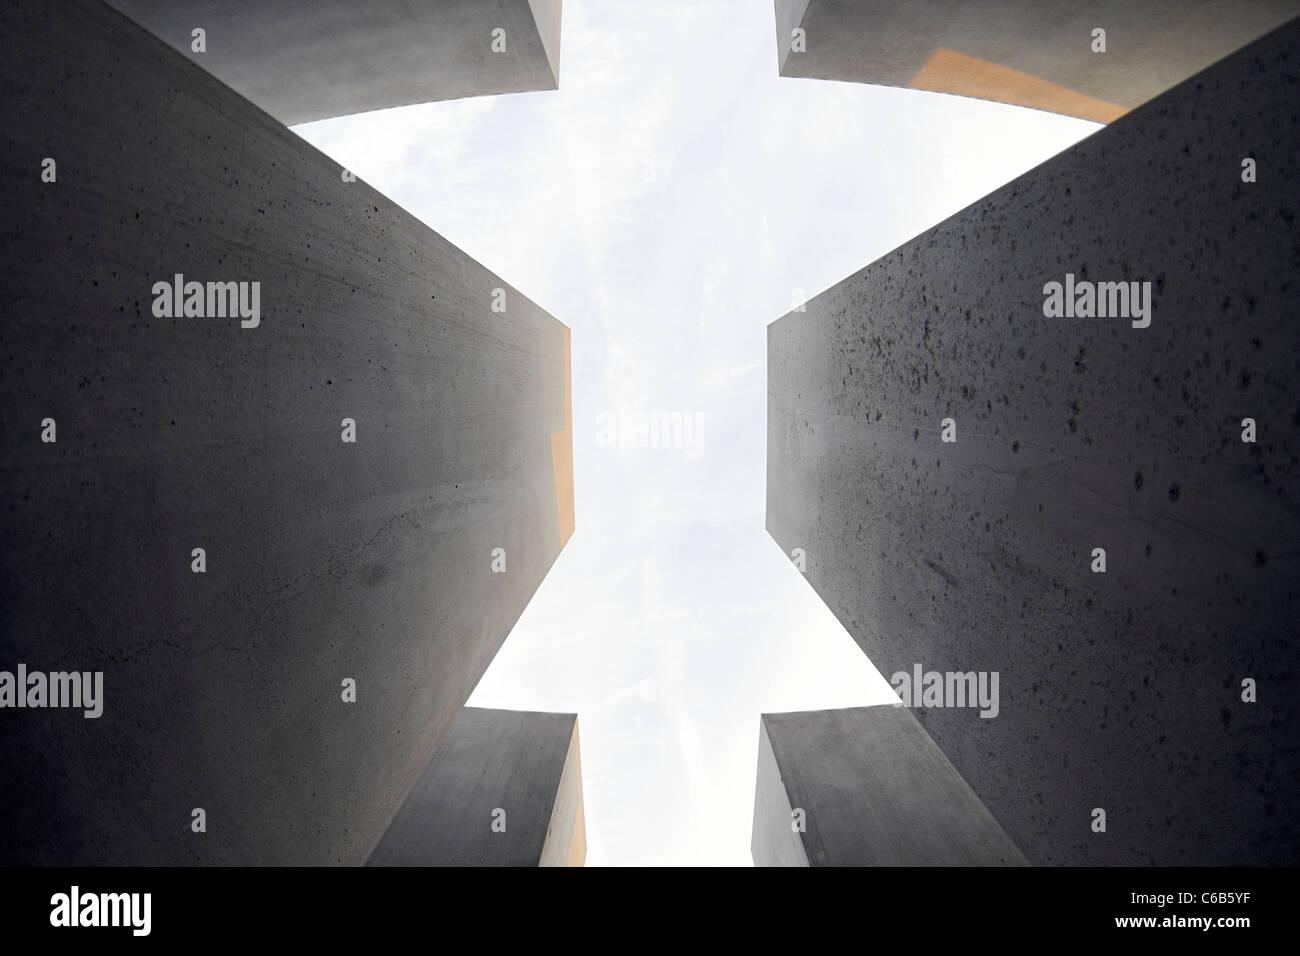 Concrete pillars of the Holocaust memorial, memorial, architect Peter Eisenman, Tiergarten, Mitte district, Berlin, - Stock Image